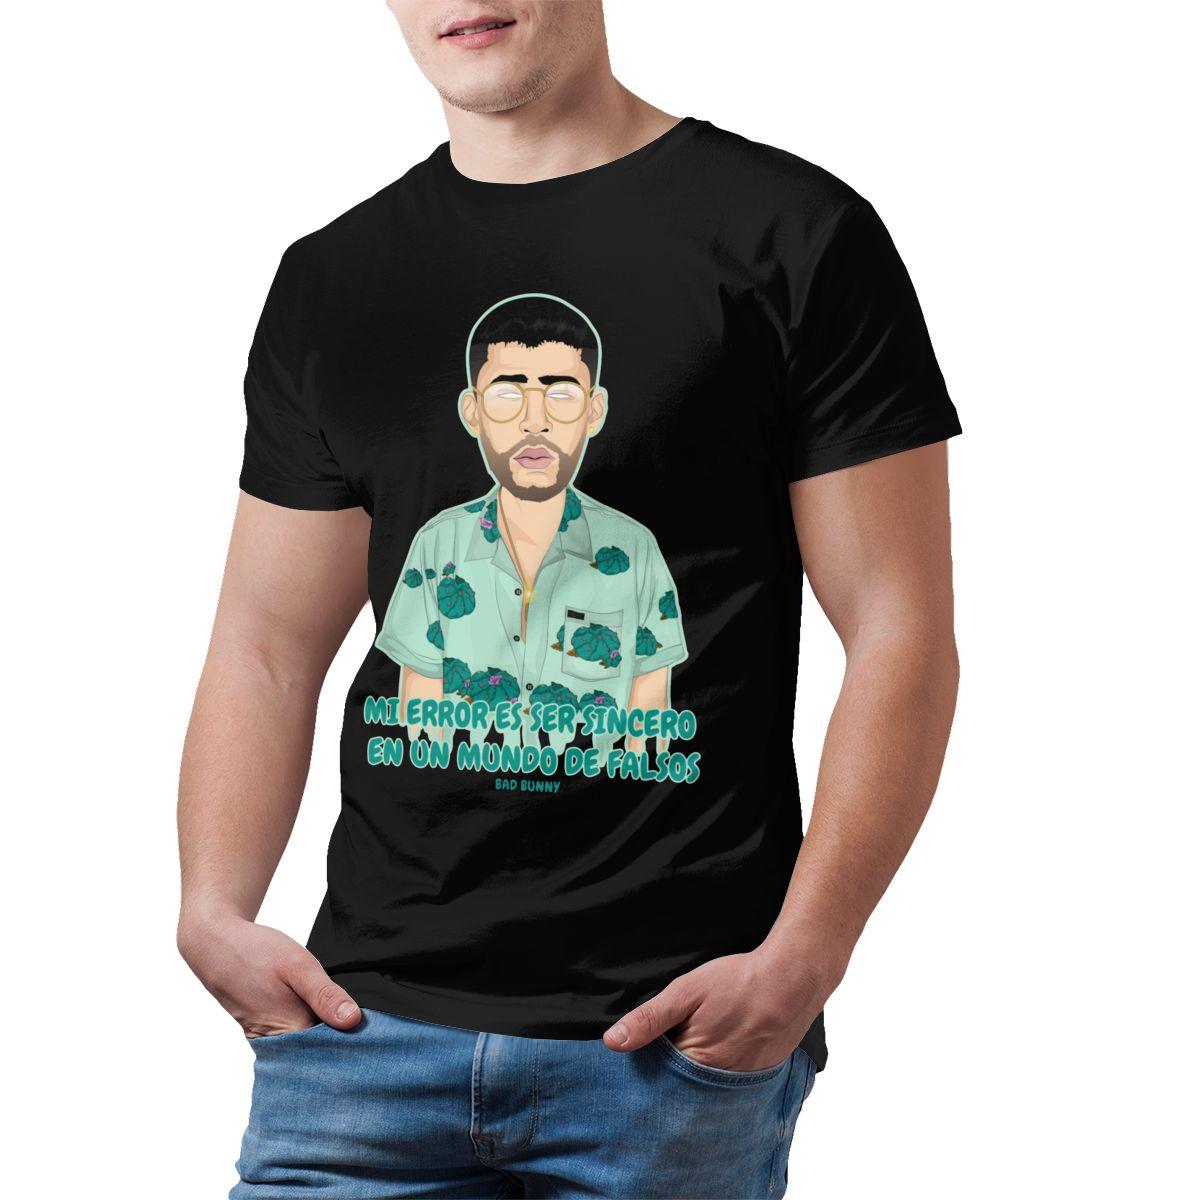 bad bunny short sleeve oversized t shirt bbm0108 6190 - Bad Bunny Store